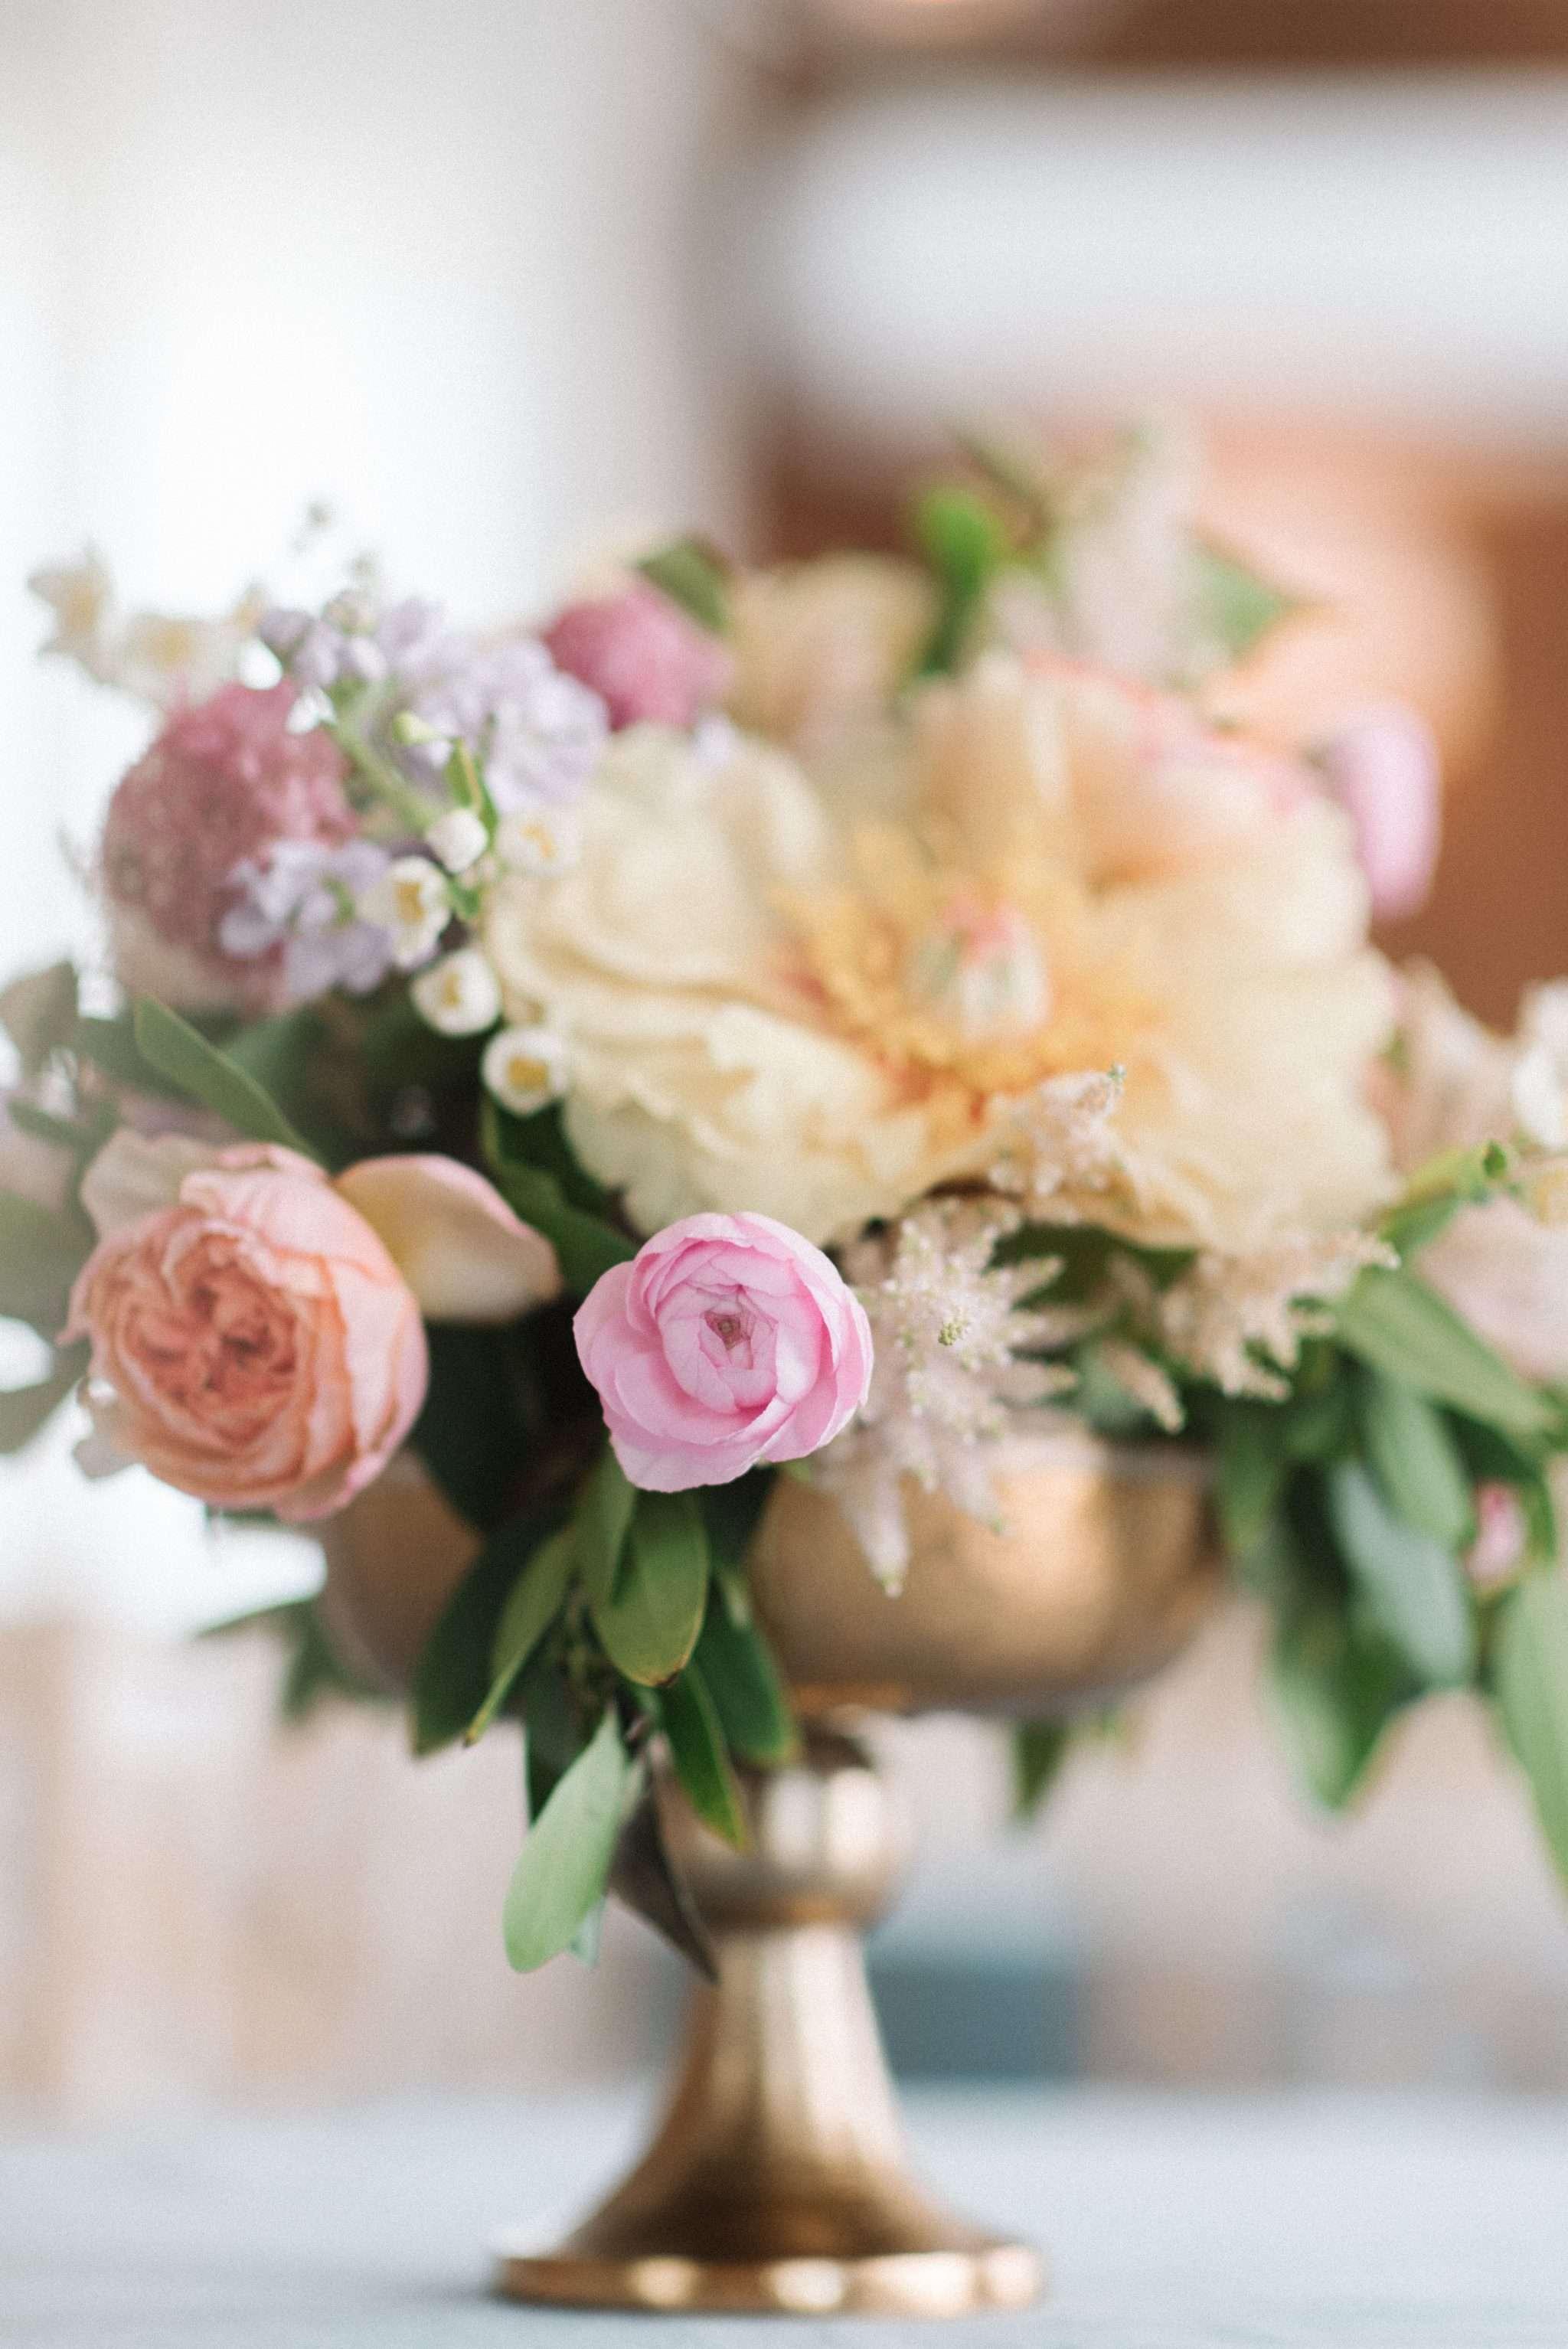 10 wedding tips you won't get from a bridal magazine   Rhyme & Reason